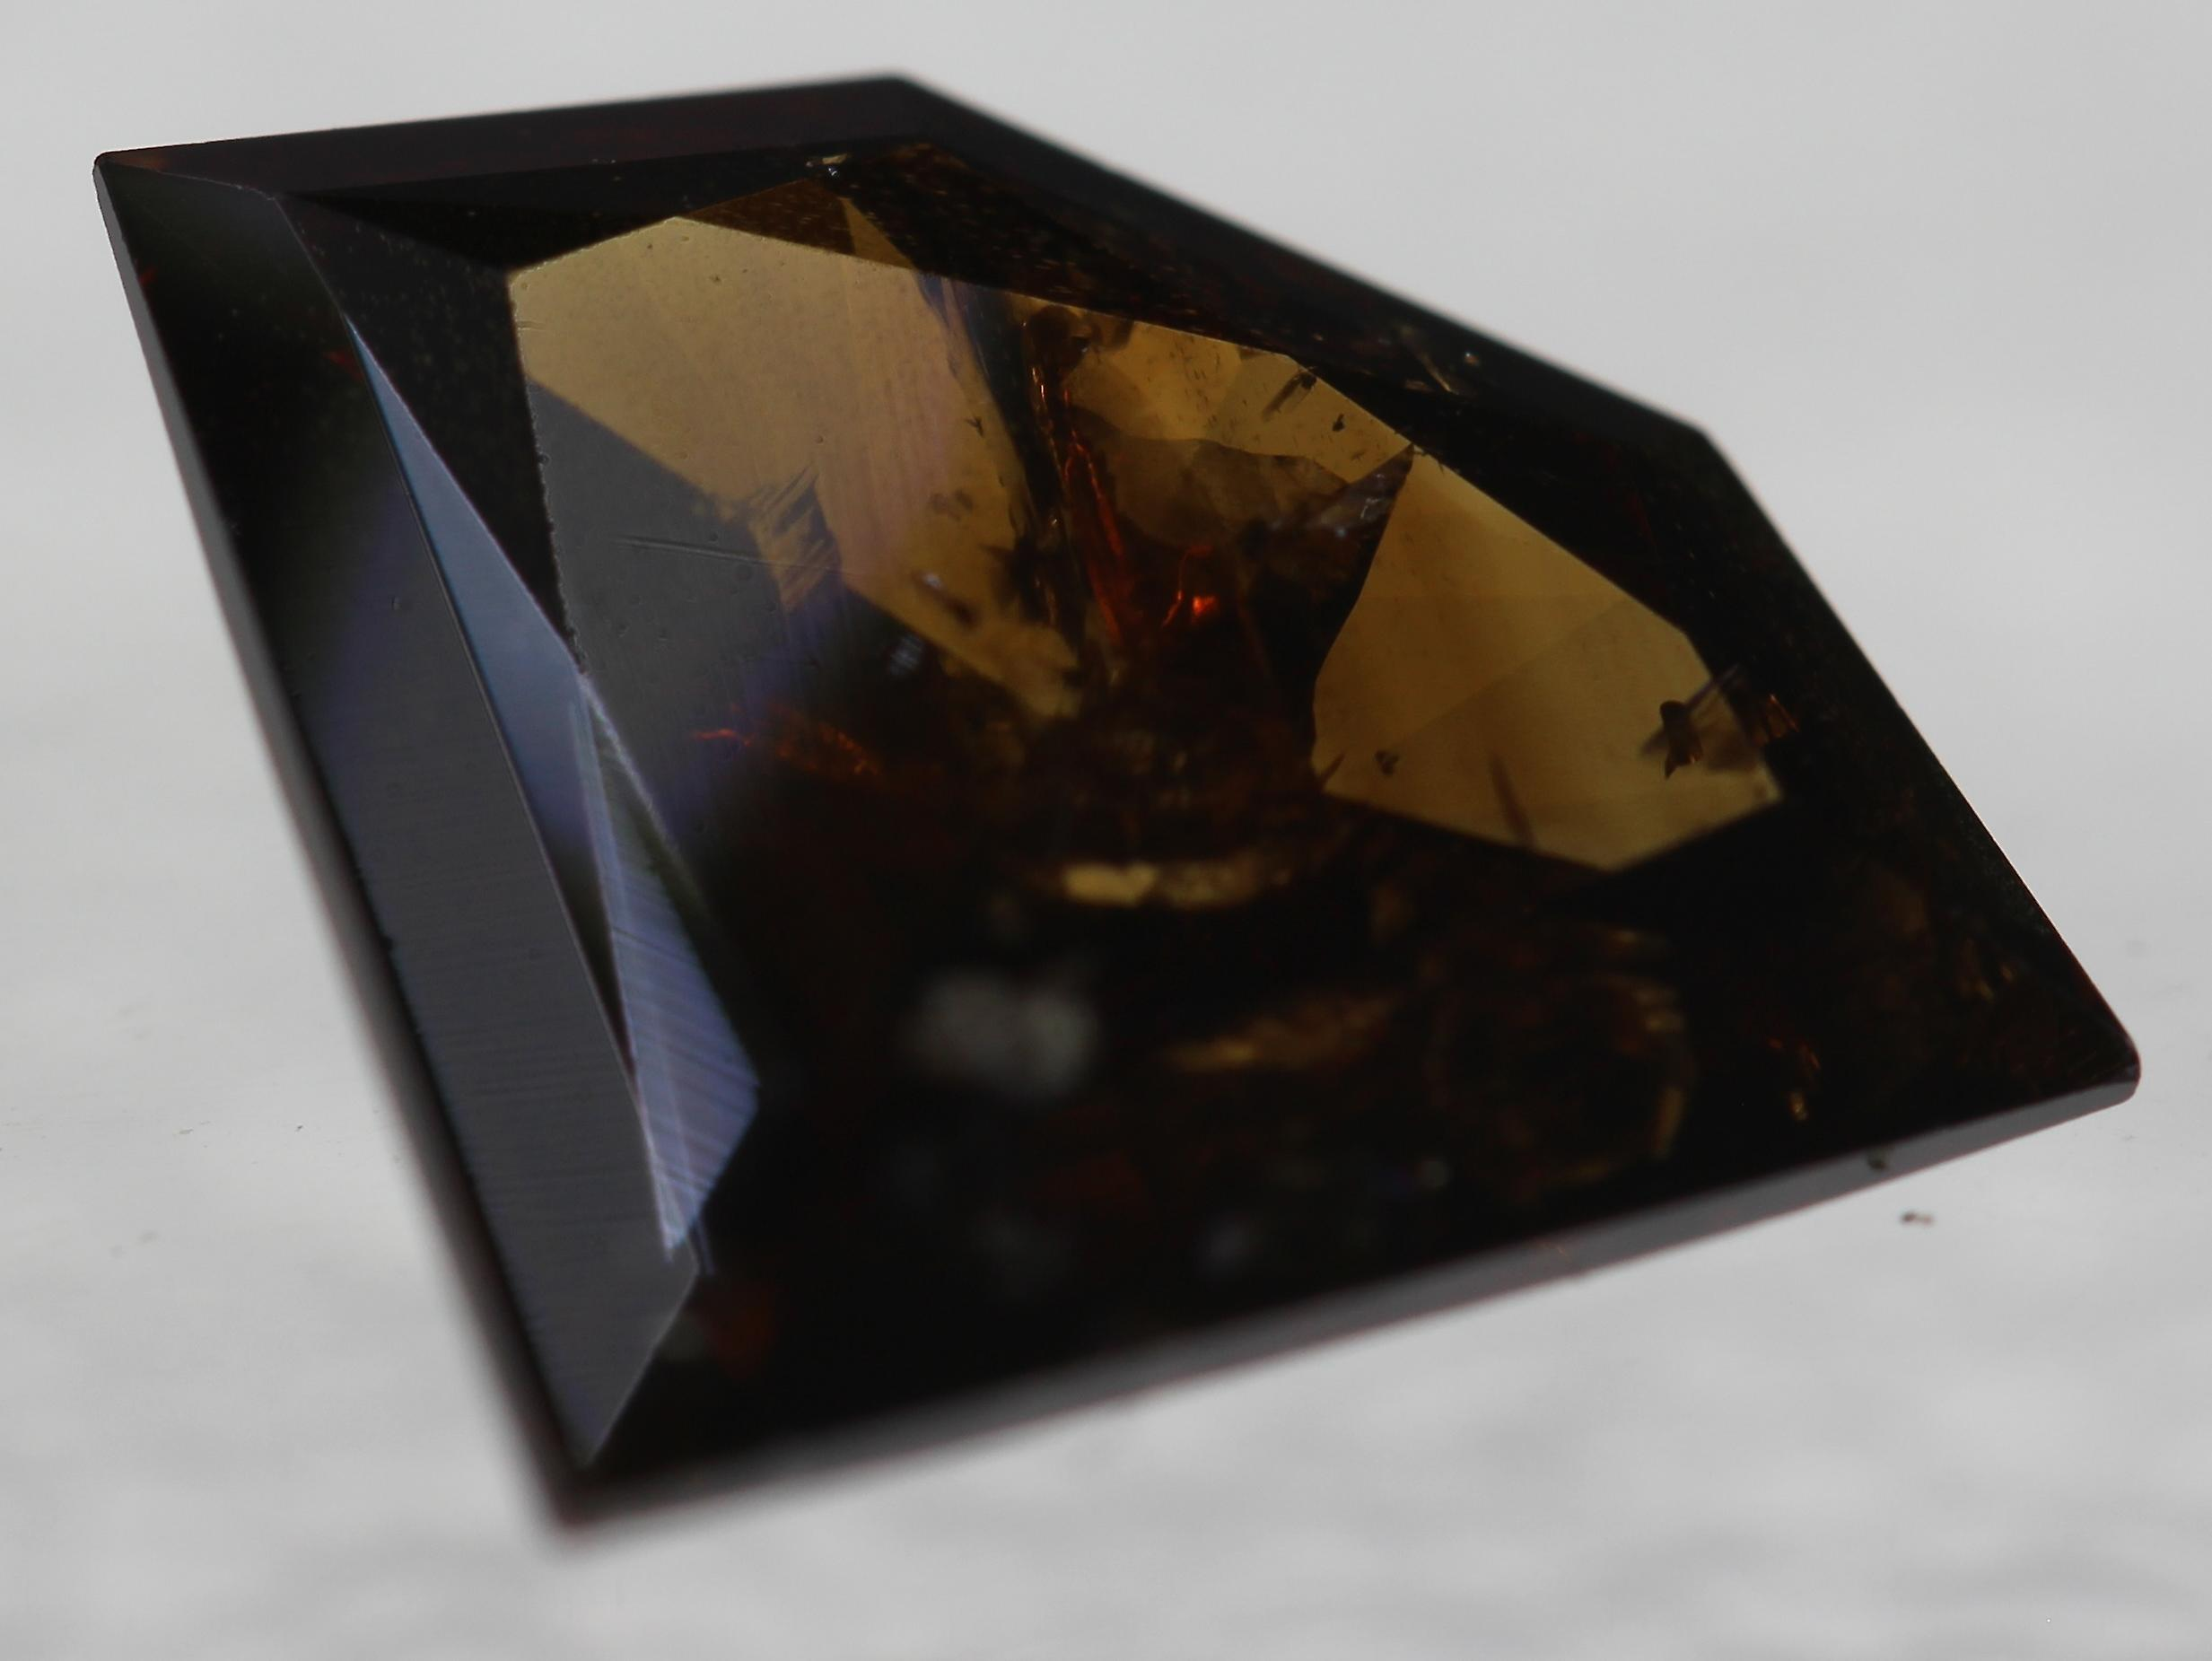 Certified 2.12 Carat Vivid Brown Shield Natural Loose Diamond 11.89x9.96mm 2VG